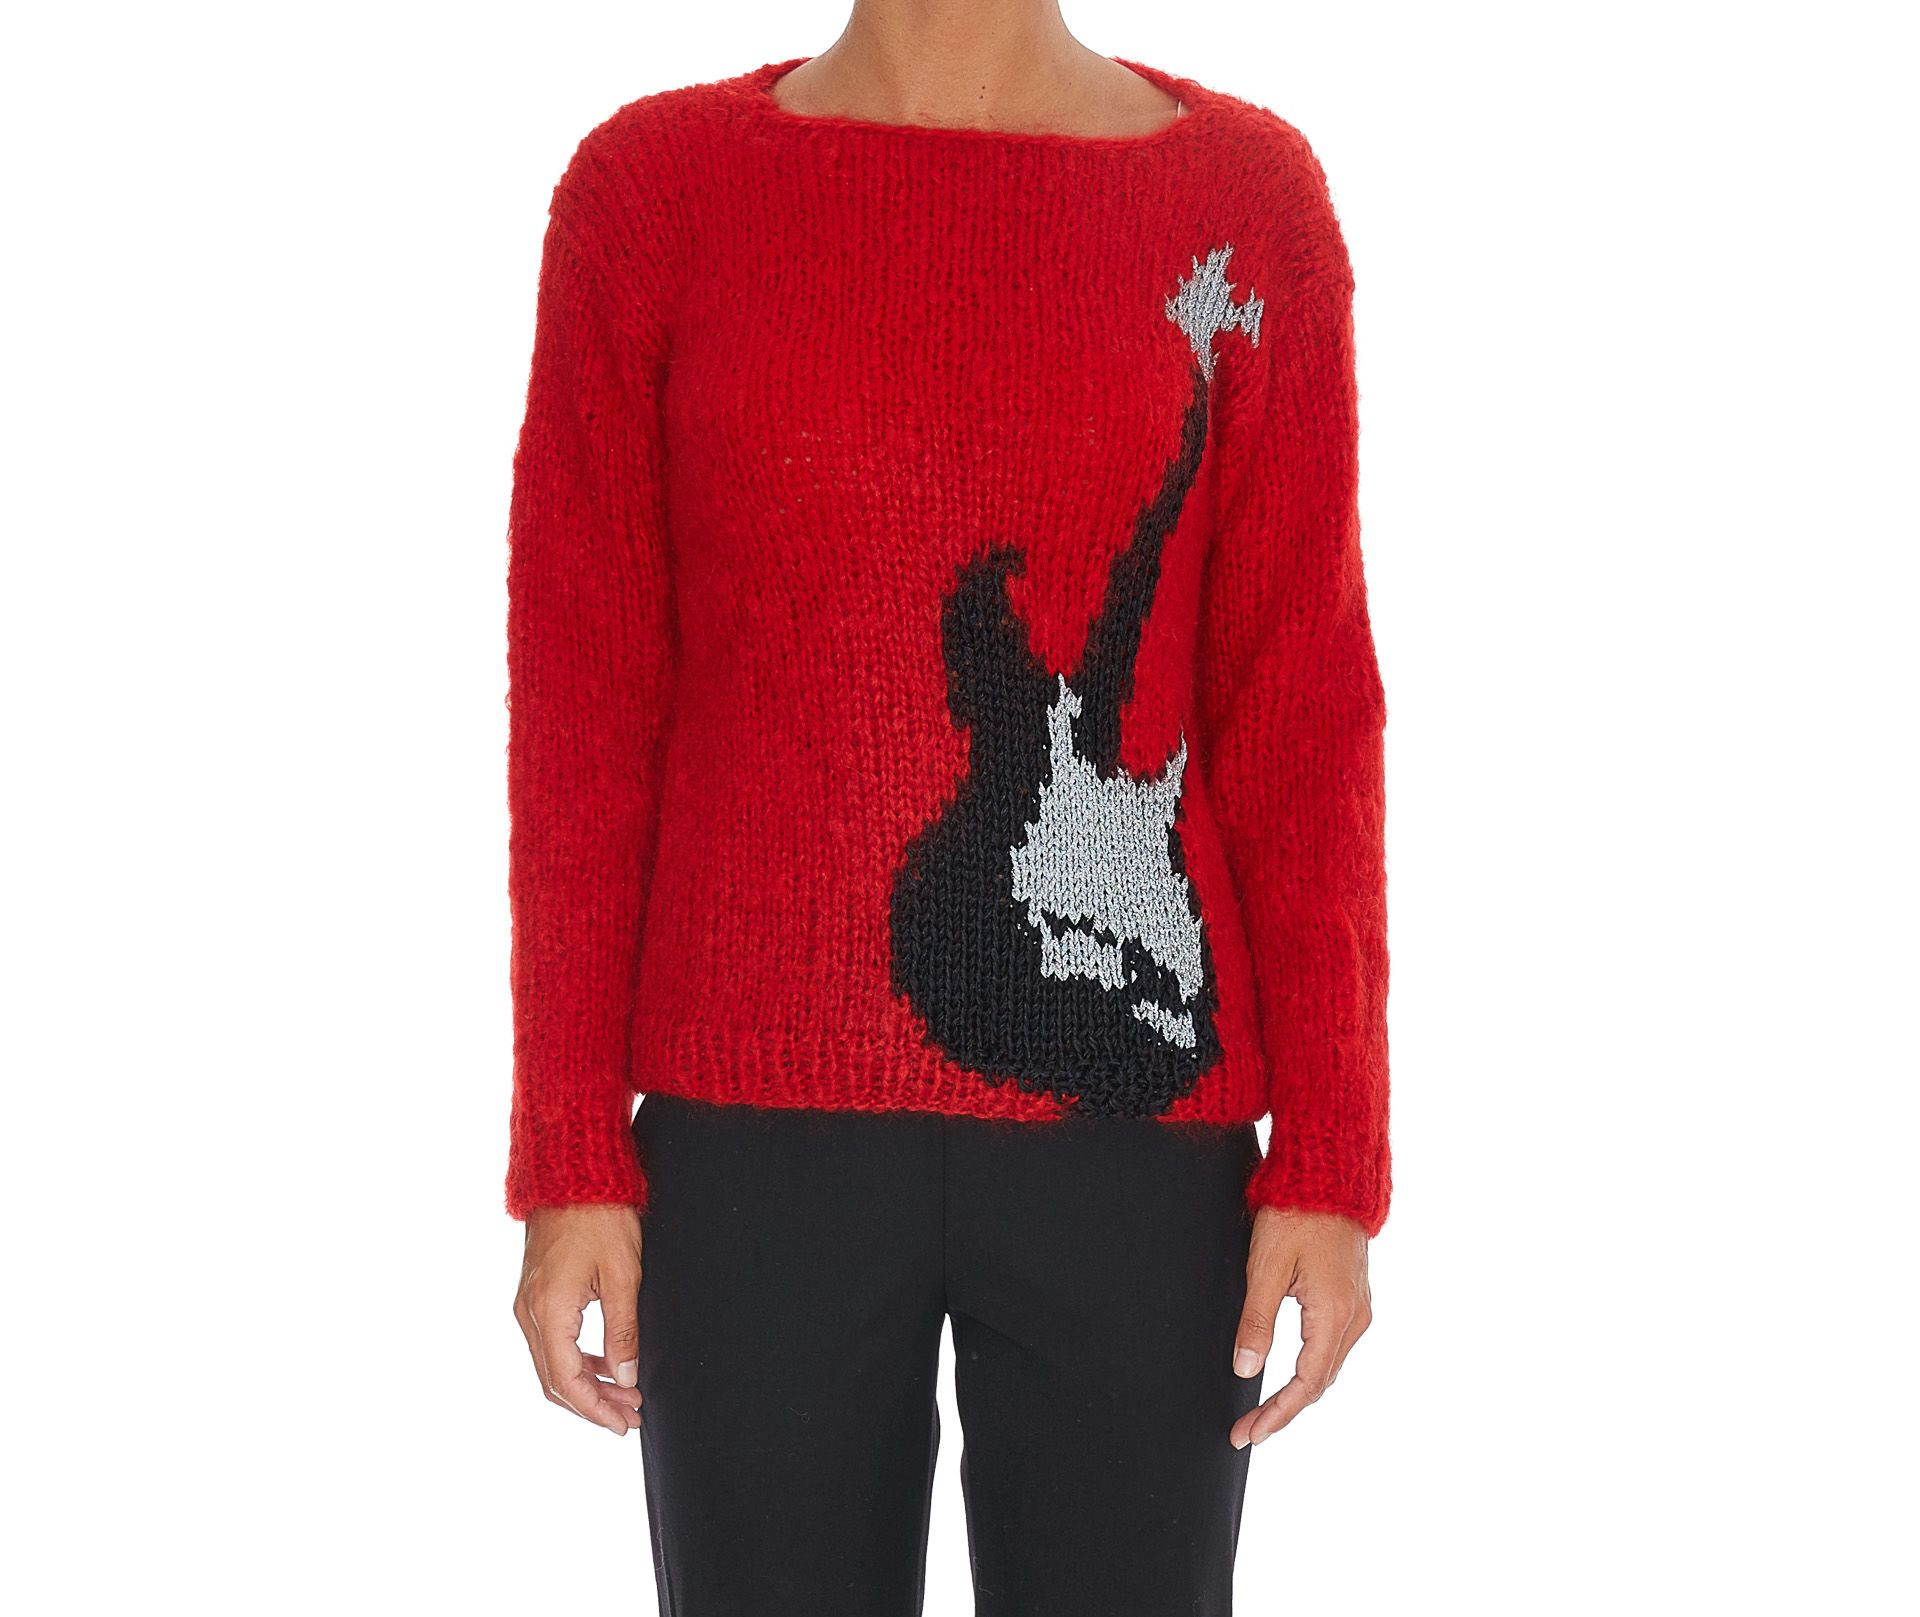 Maiami Sweater